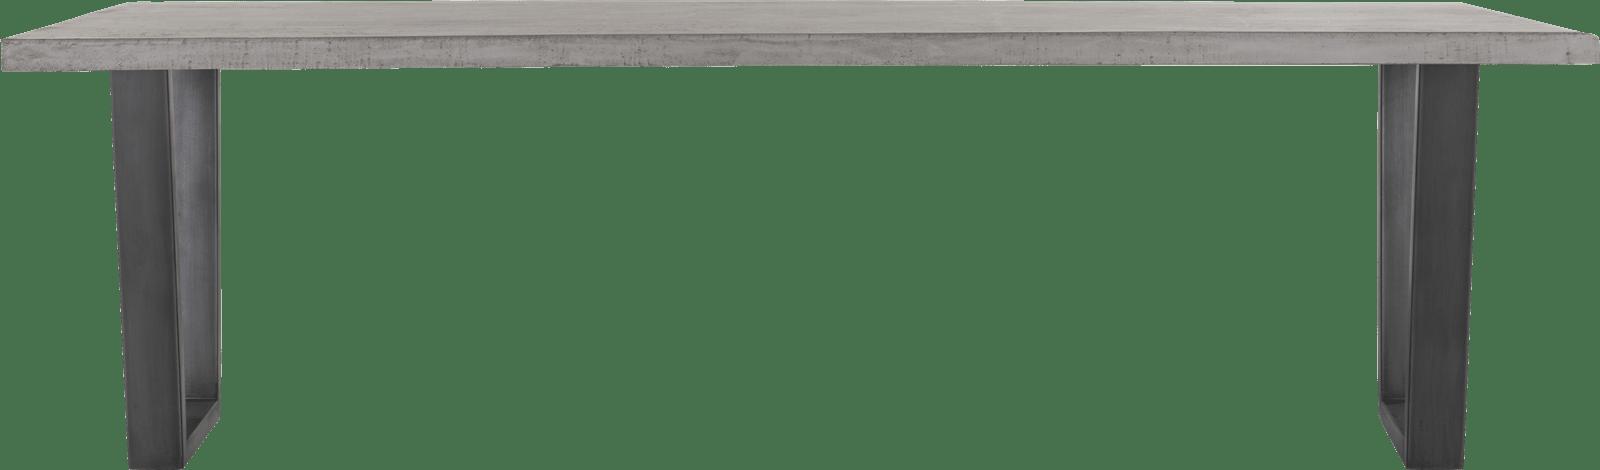 Farmero - eetkamertafel 210 x 100 cm